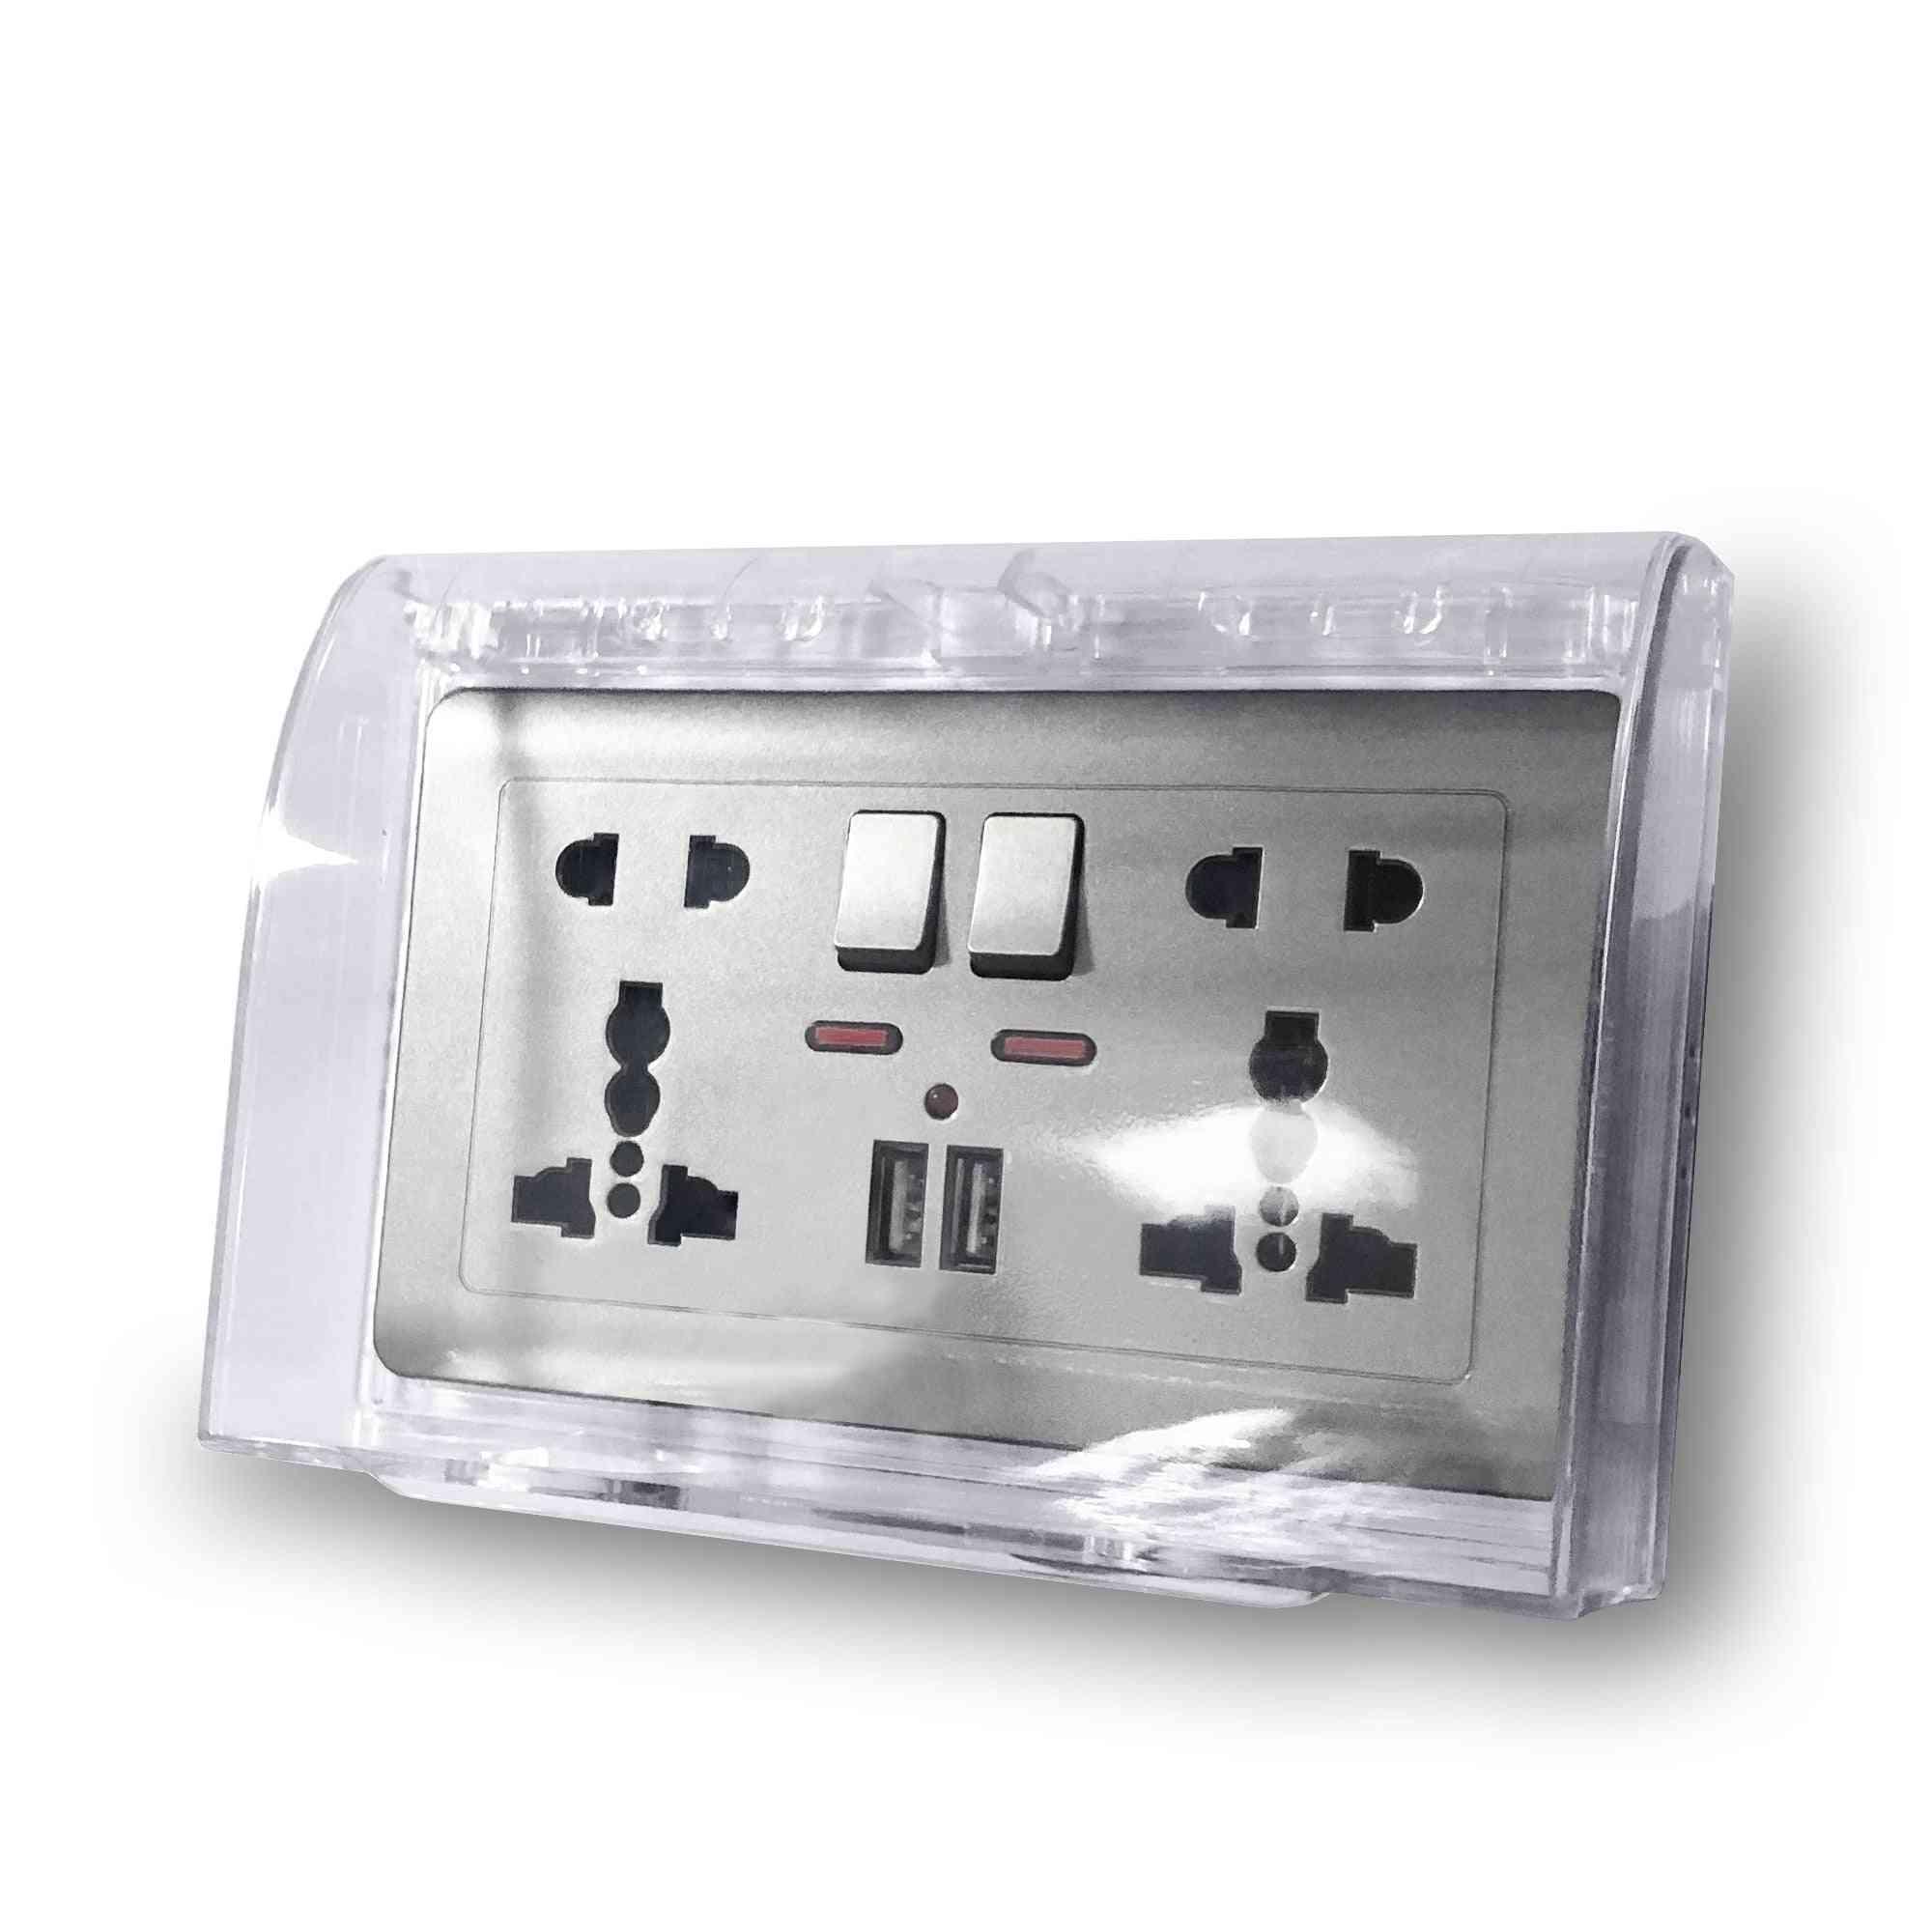 Rectangular Standard Switch Socket Protective Box, Waterproof Cover